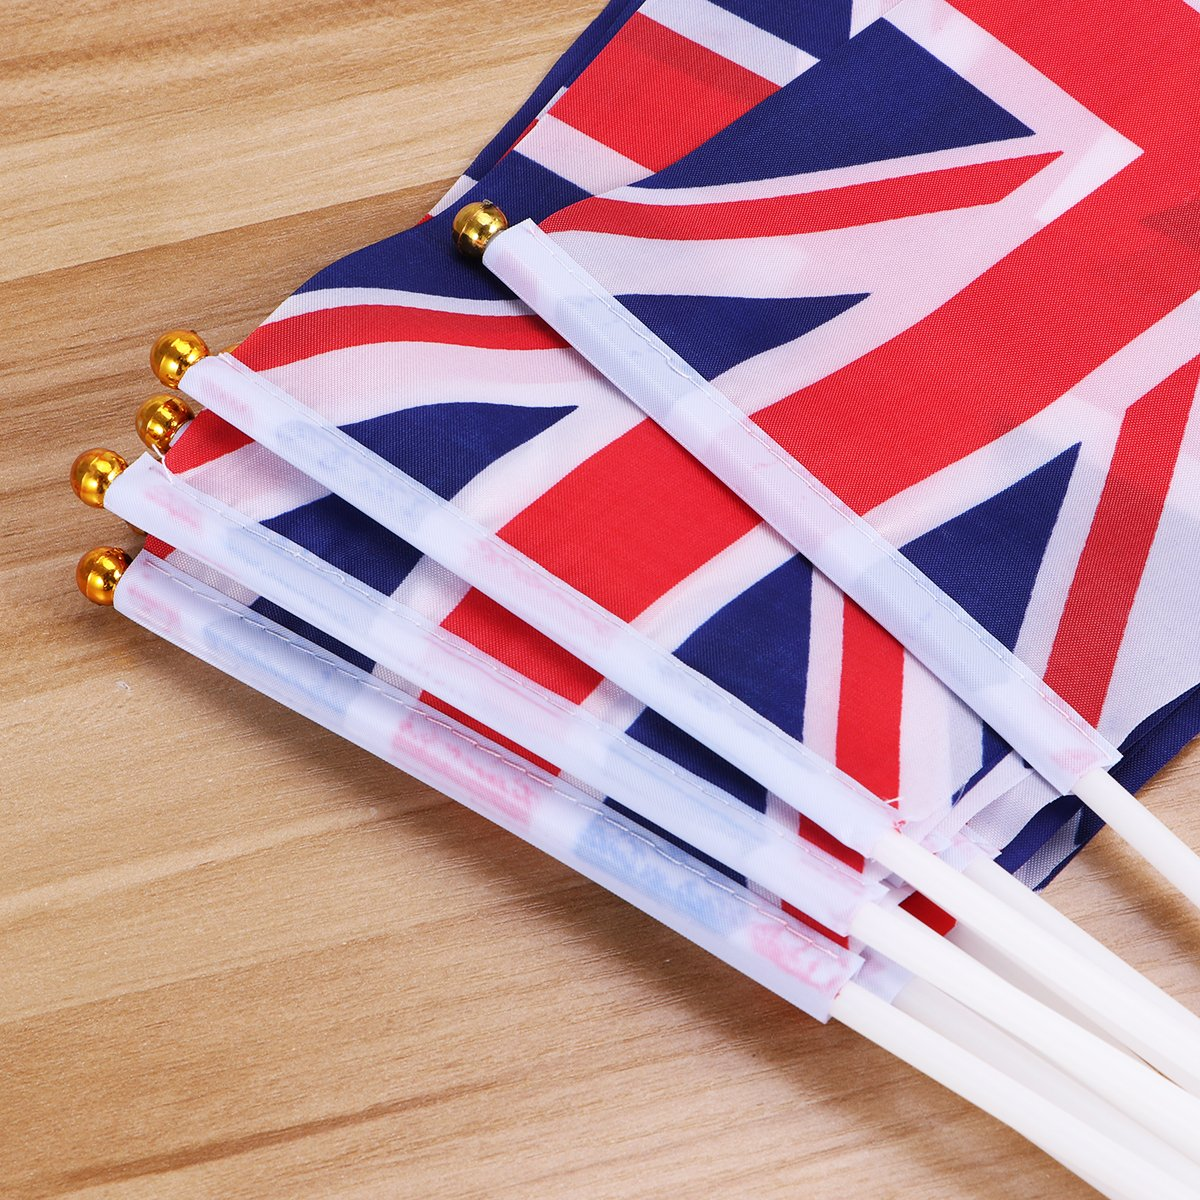 100pcs Union Jack Hand Waving Flag Royal Jubilee UK GB Great Britain Flags